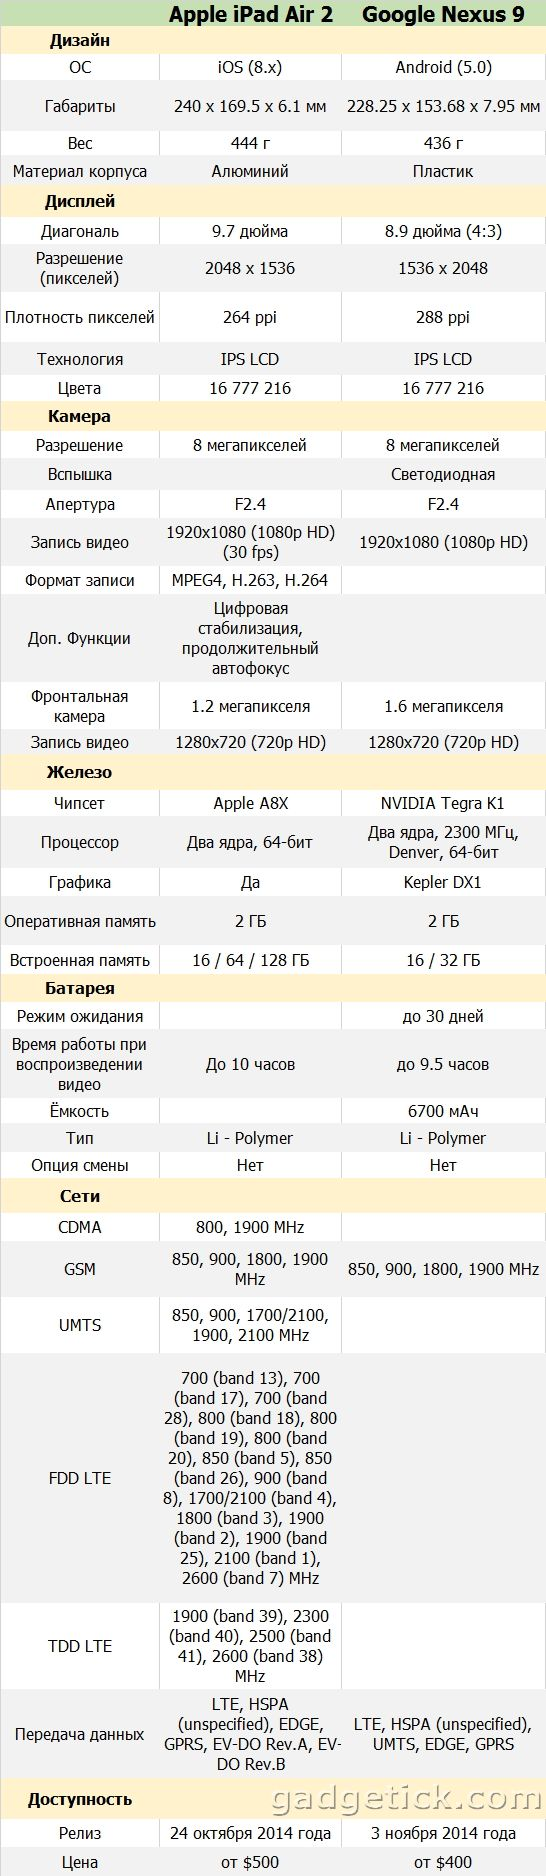 Сравнение iPad Air 2 и Nexus 9